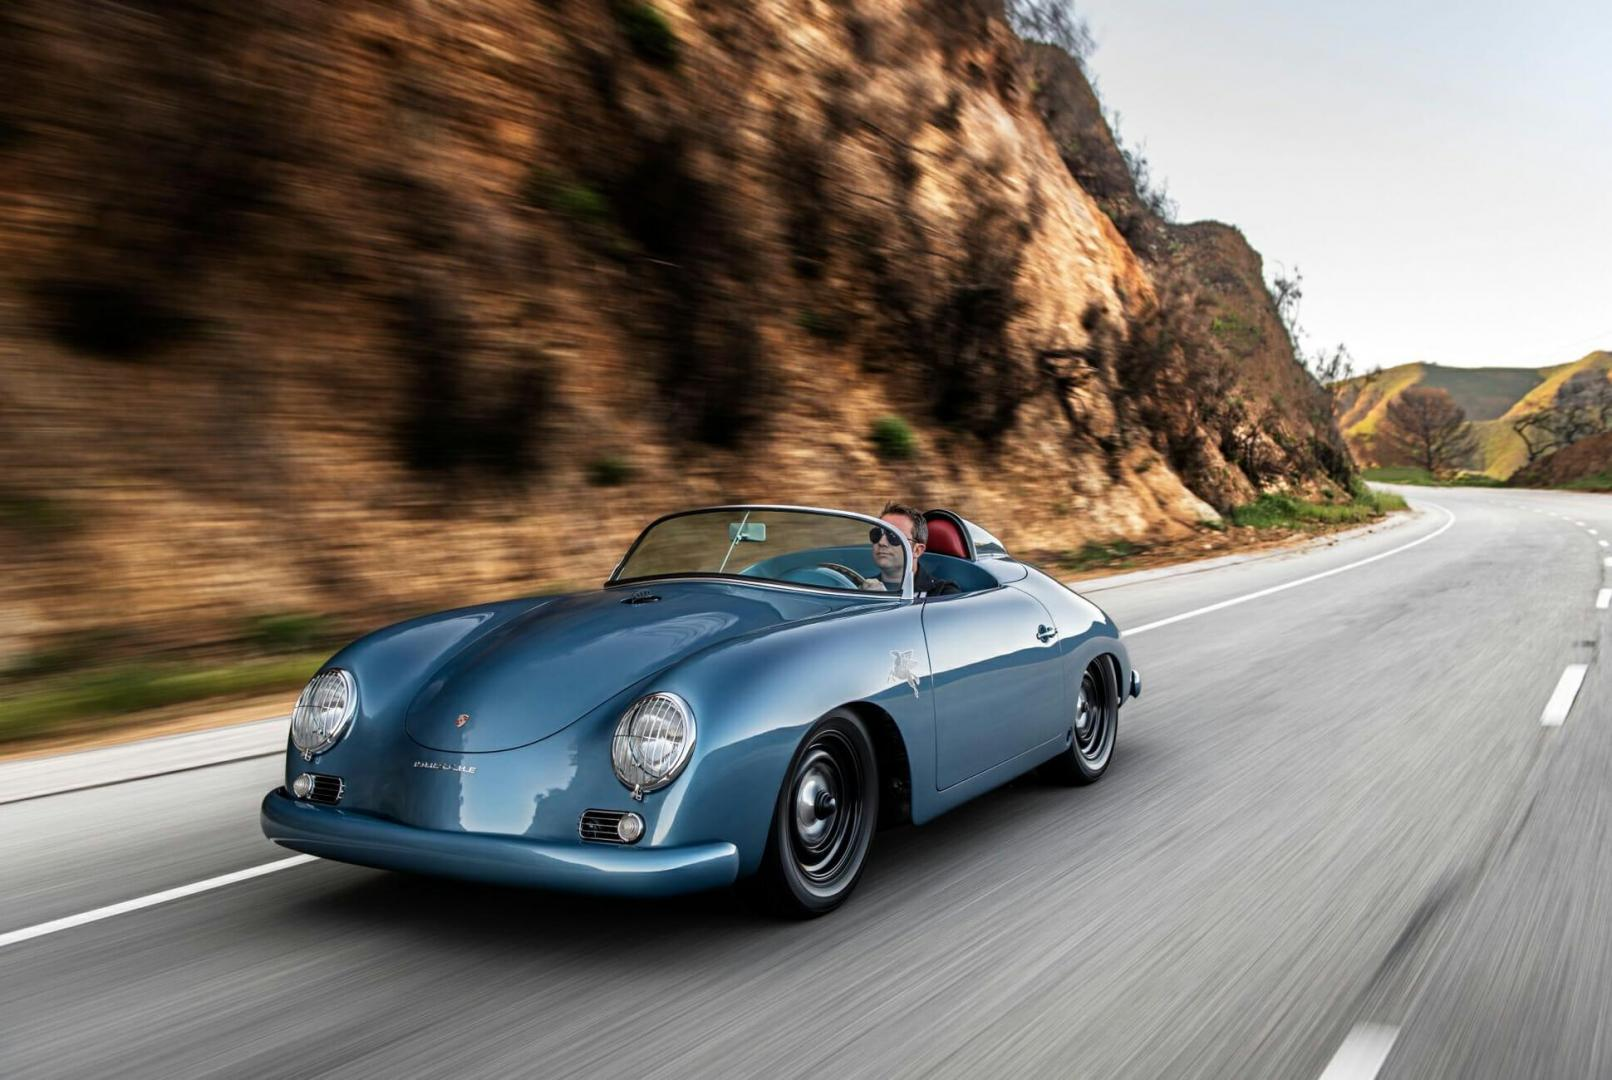 Porsche-356-1959-gear-patrol-slide-00.jpg